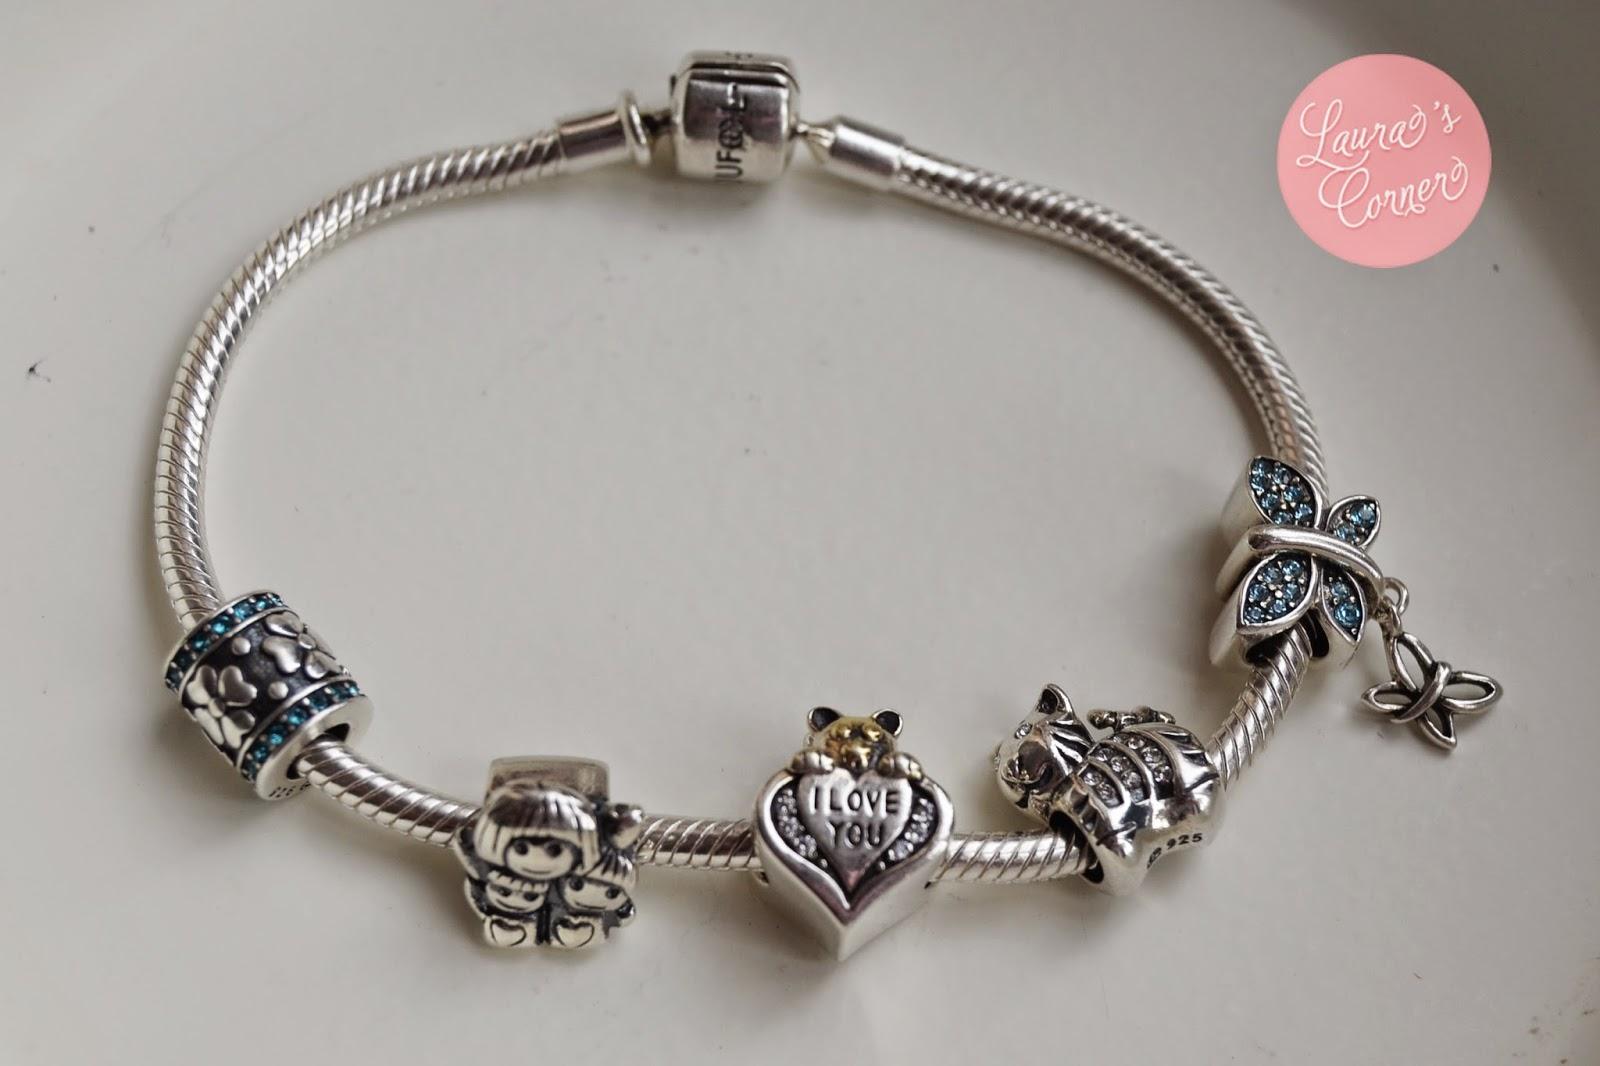 e80c83b80f50b Soufeel Charms Fit Pandora Bracelet - Arm Designs